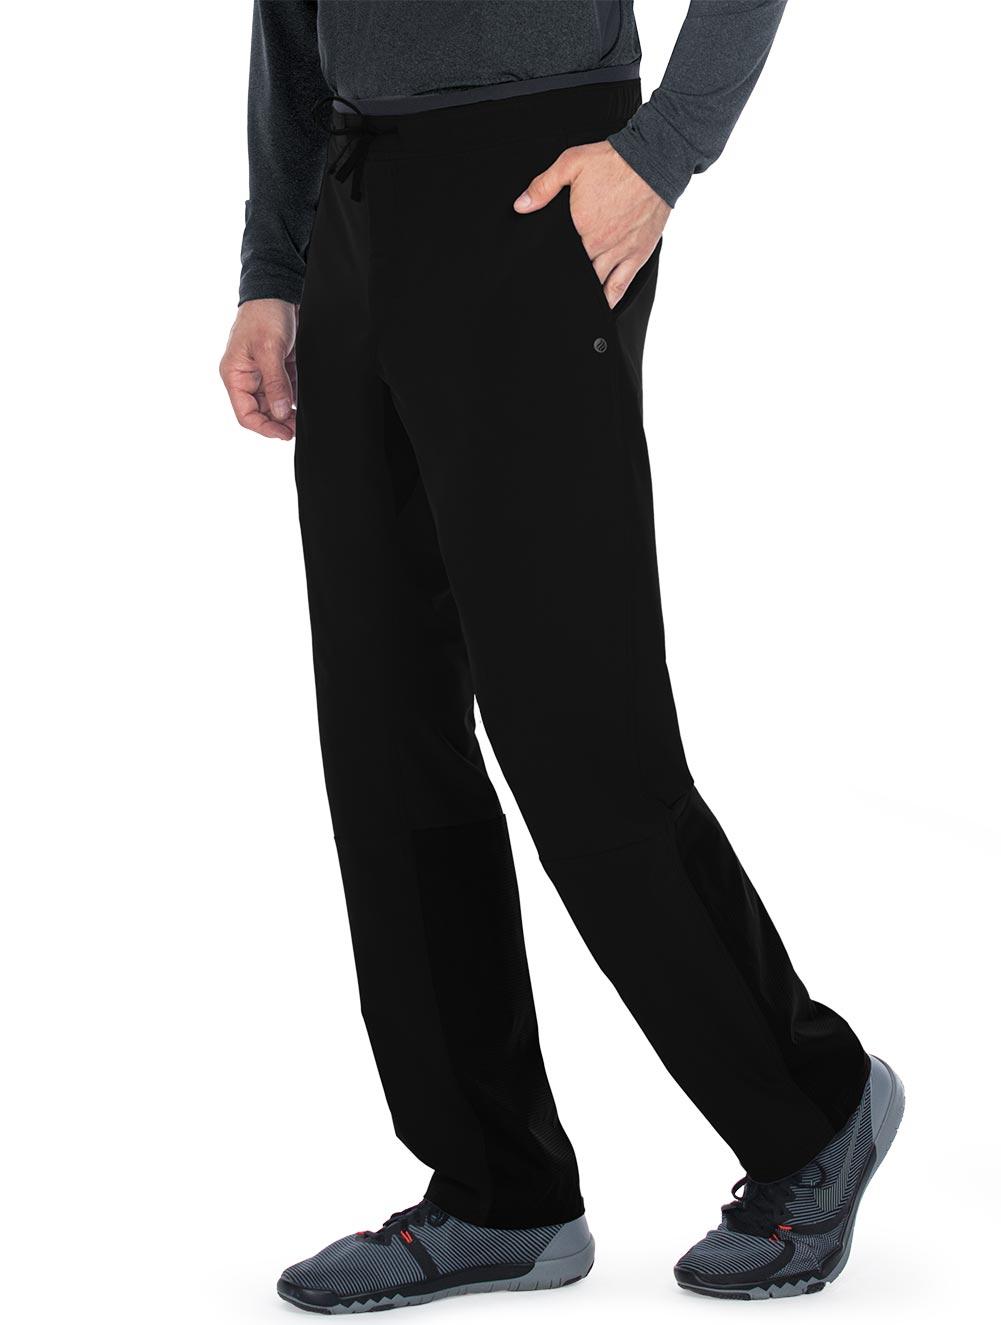 Men's Zipfly Cargo Scrub Pants